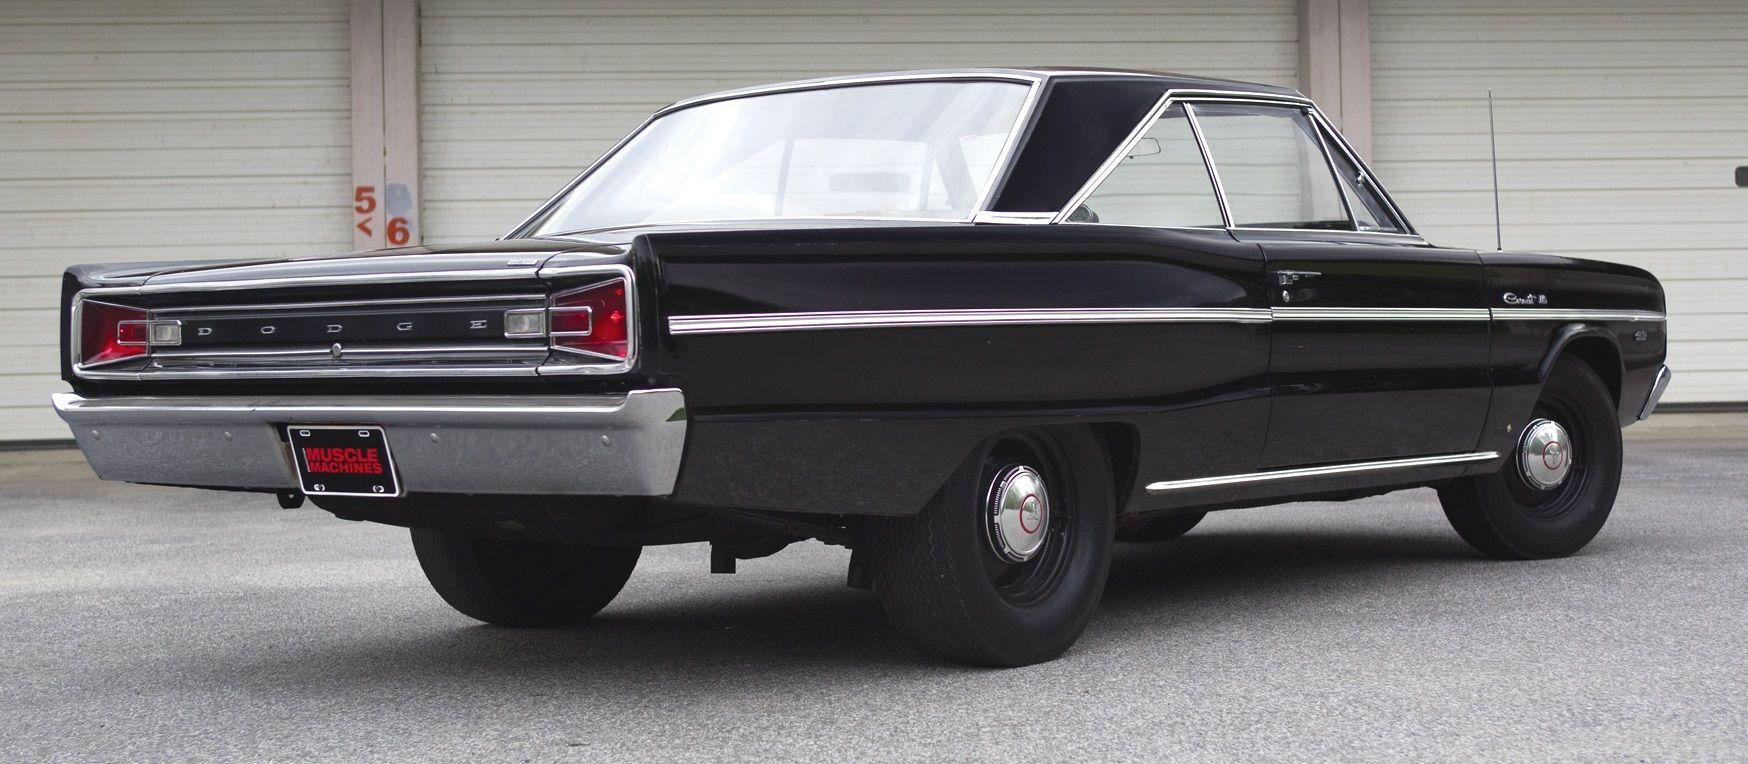 An Old Friend – 1966 Dodge Hemi Coronet | Hemmings Daily